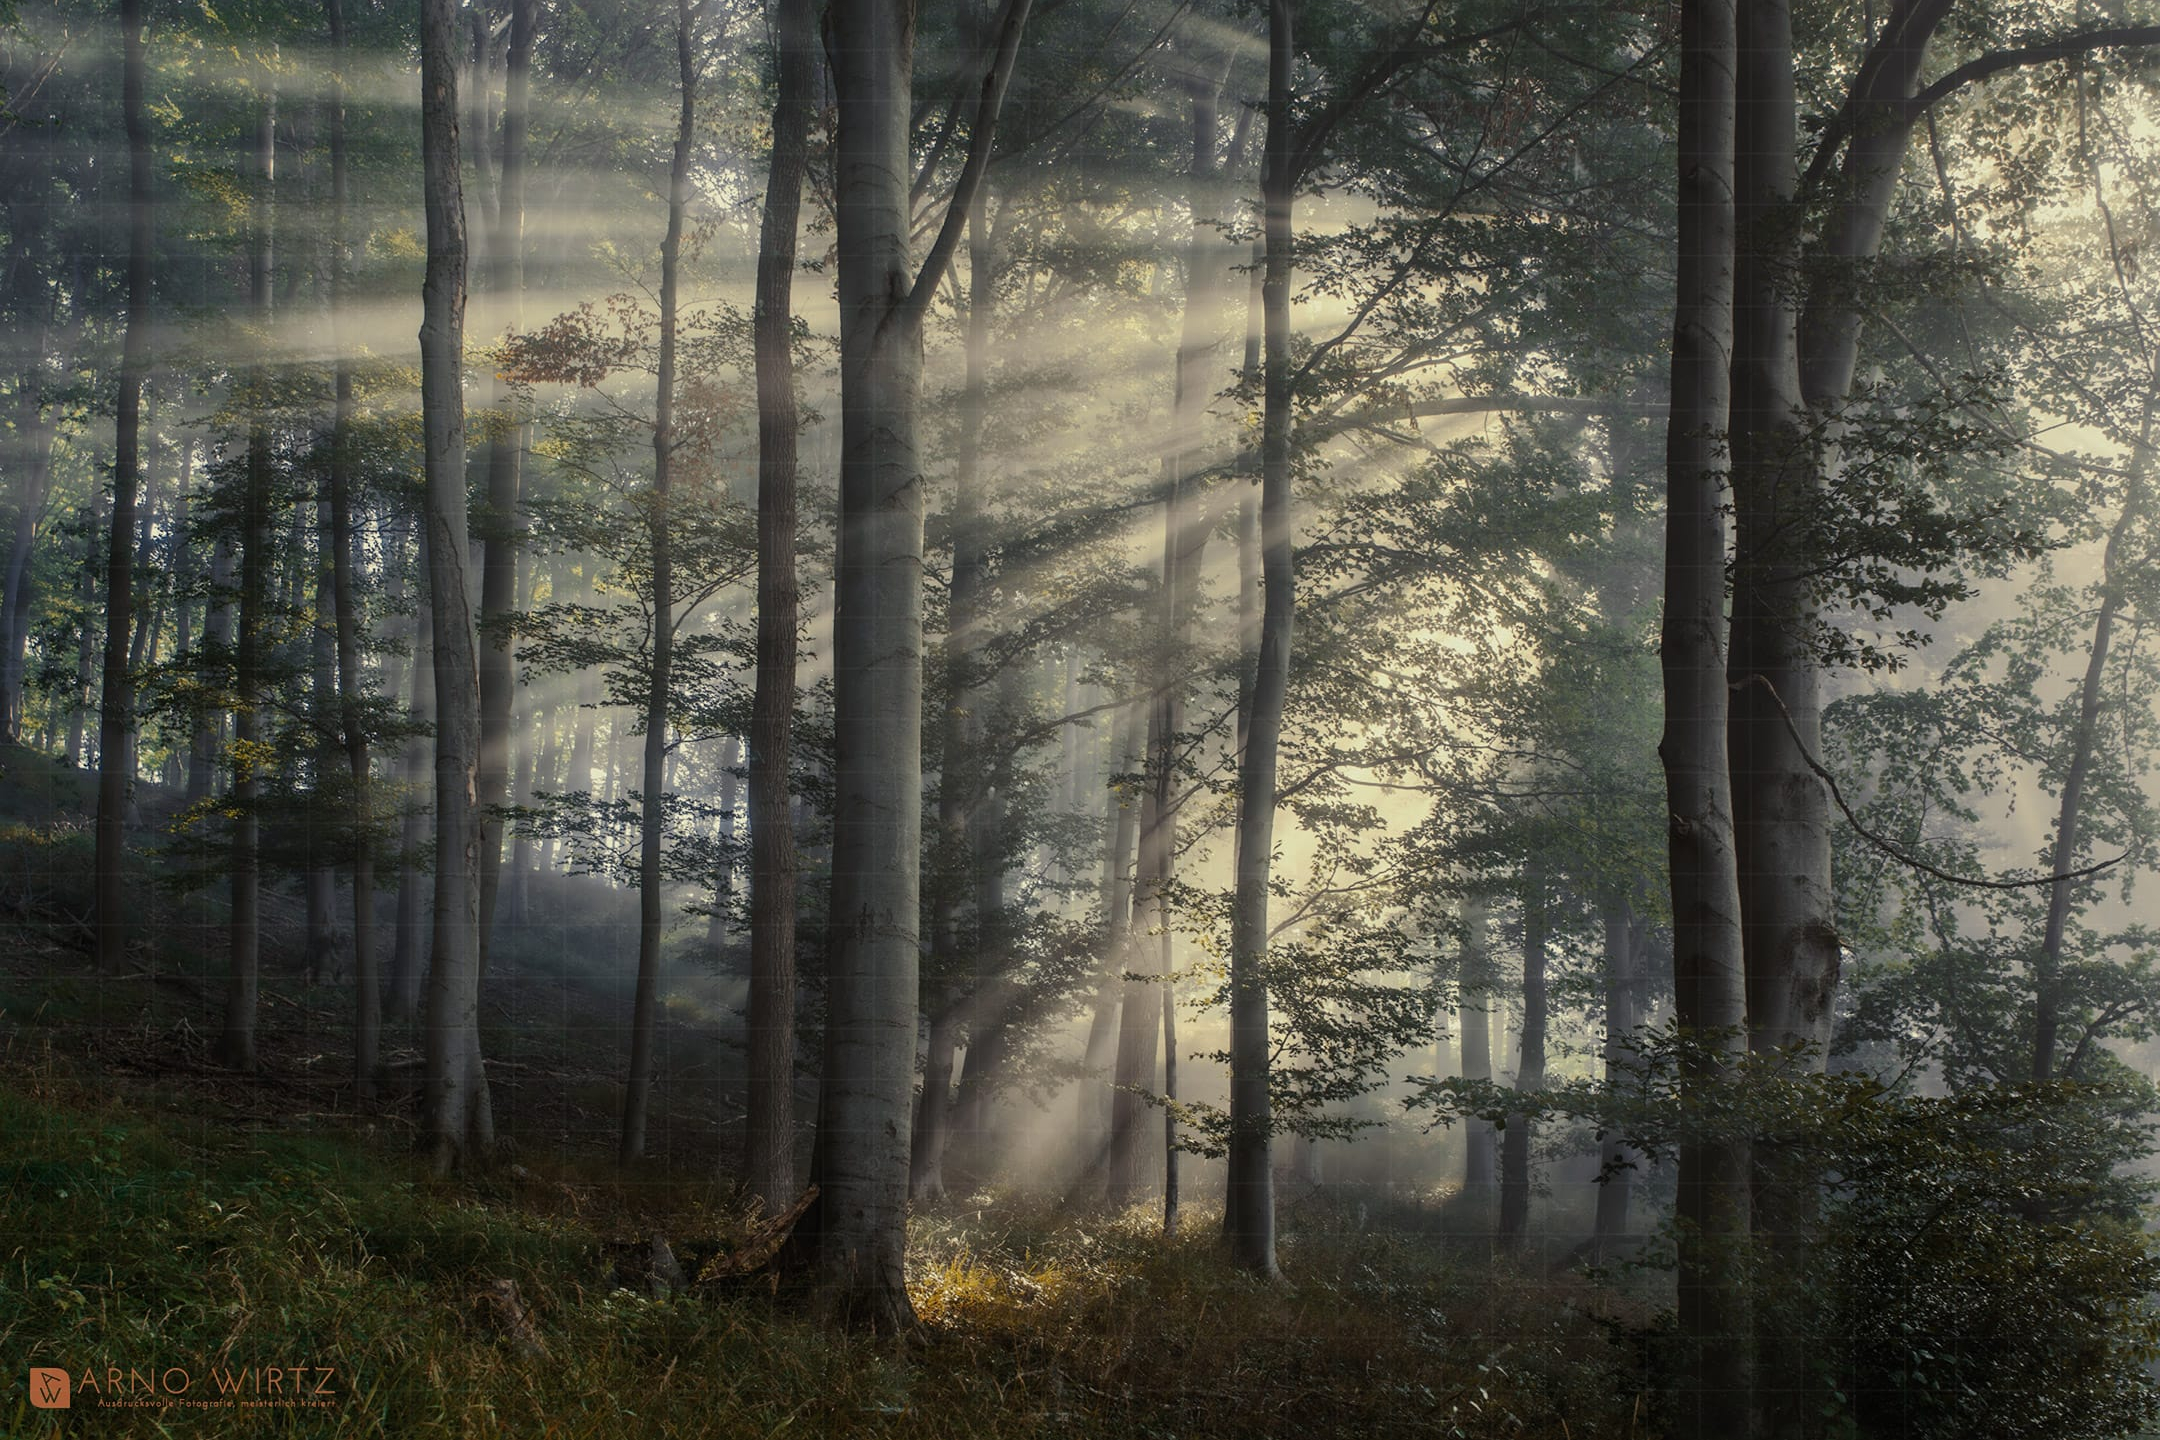 Copyright © 2021 Arno Wirtz - Wald in Erkeln | Nethetal, Sep. 2021